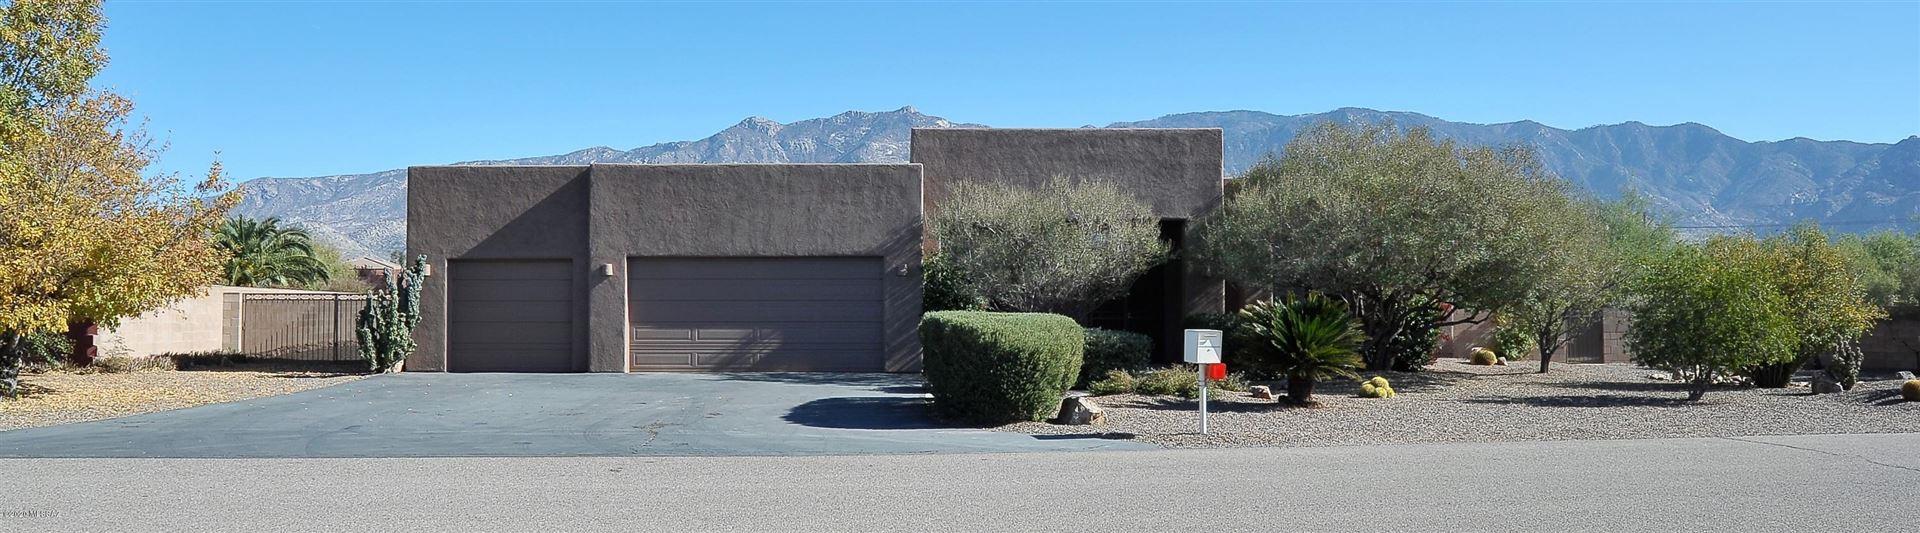 15224 N Appleton Avenue, Tucson, AZ 85739 - #: 22029943